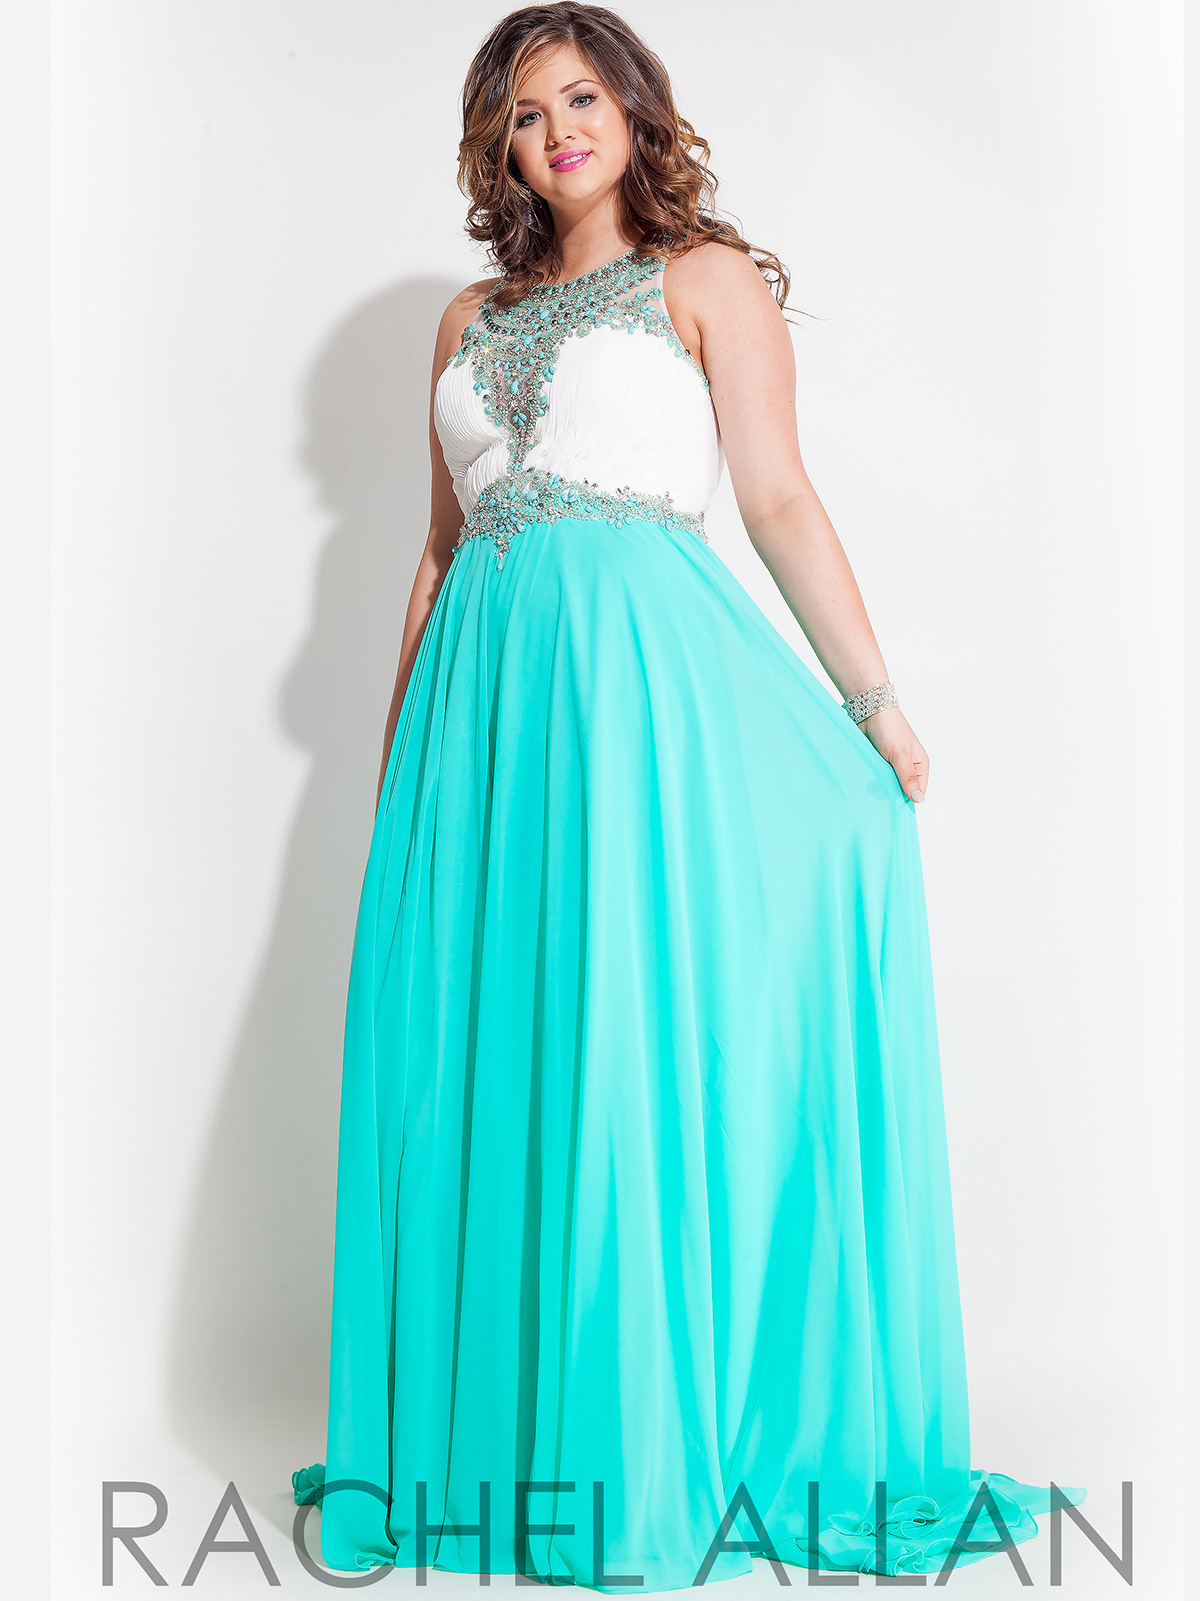 where to buy wedding dresses near me photo - 1